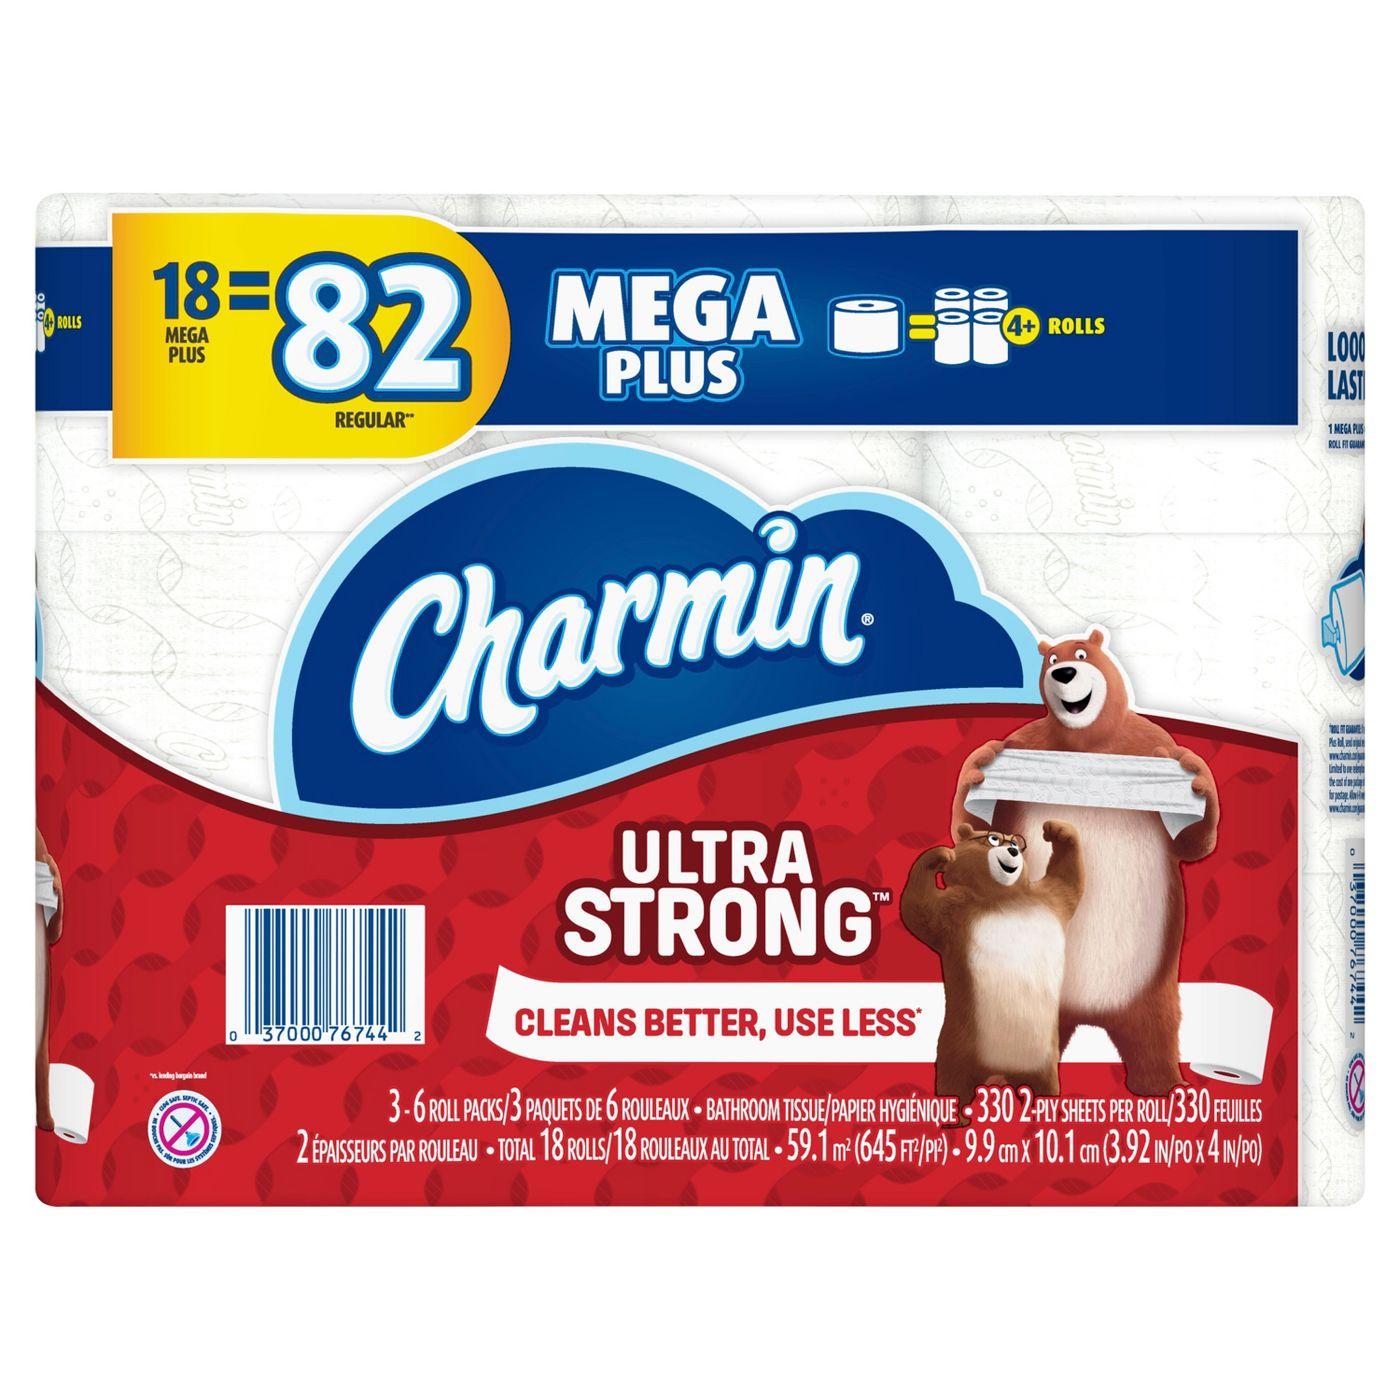 18 Mega Plus Rolls of Charmin Ultra Strong Toilet Paper (equals 82 regular rolls)